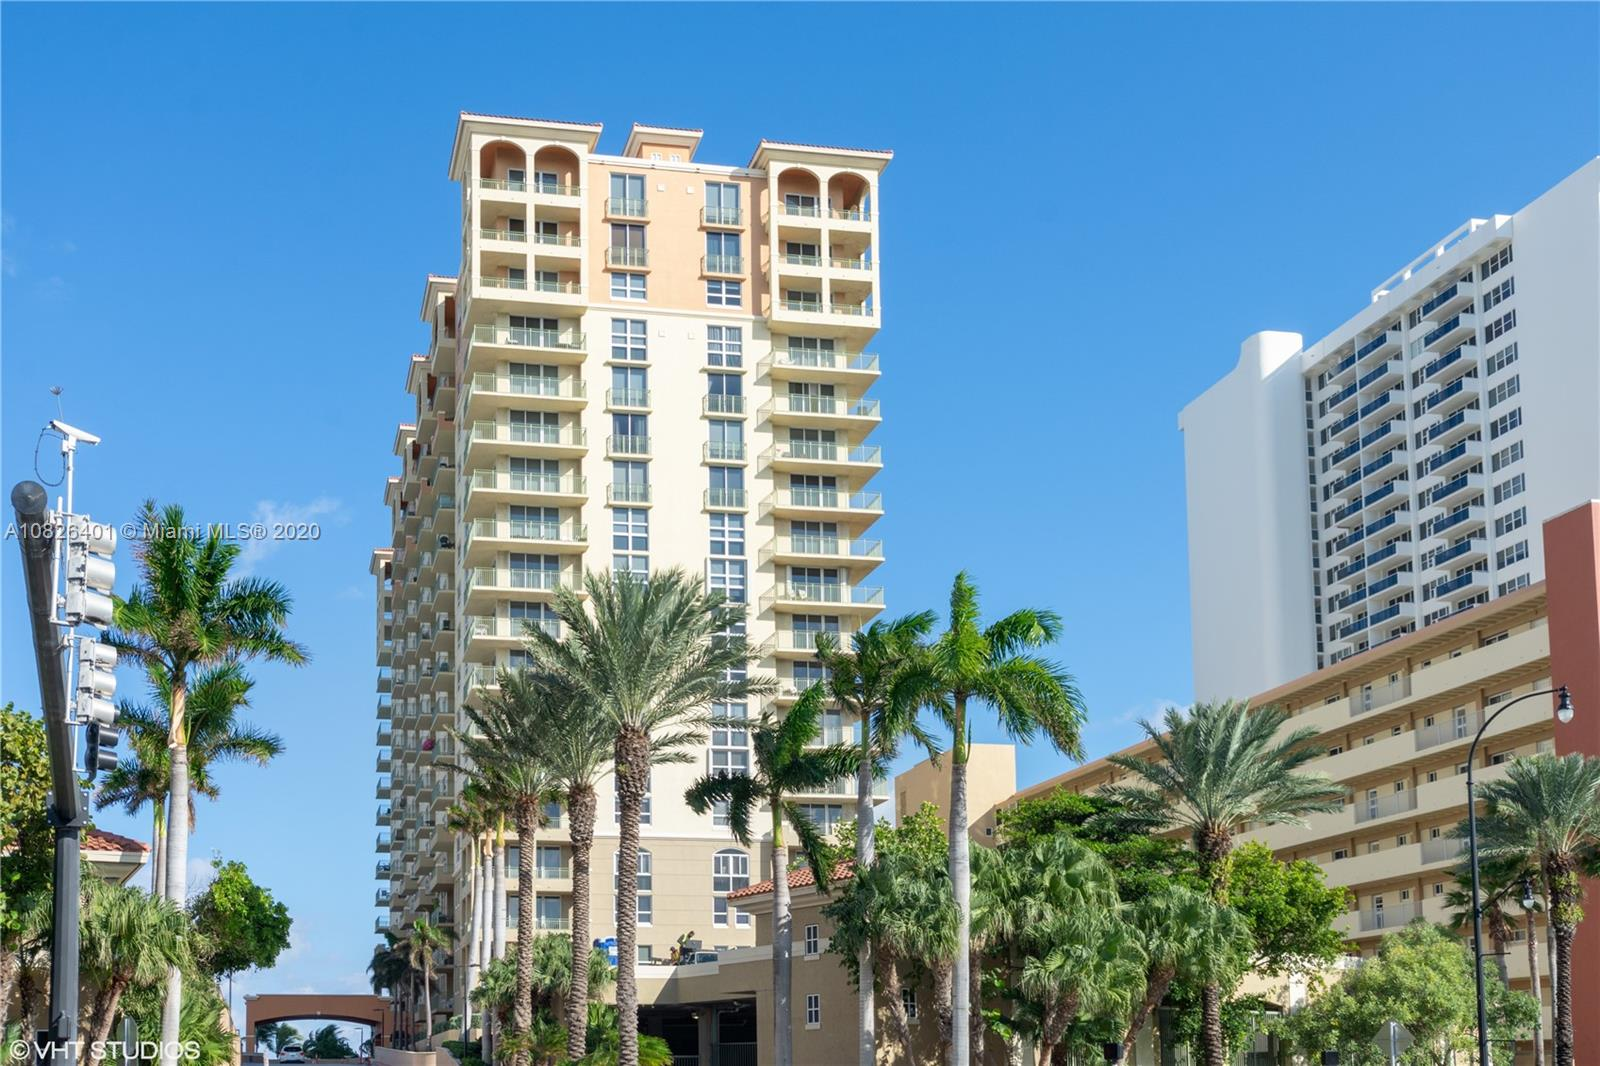 2080 OCEAN DR # 207, Hallandale Beach, Florida 33009, 2 Bedrooms Bedrooms, ,2 BathroomsBathrooms,Residential Lease,For Rent,2080 OCEAN DR # 207,A10826401